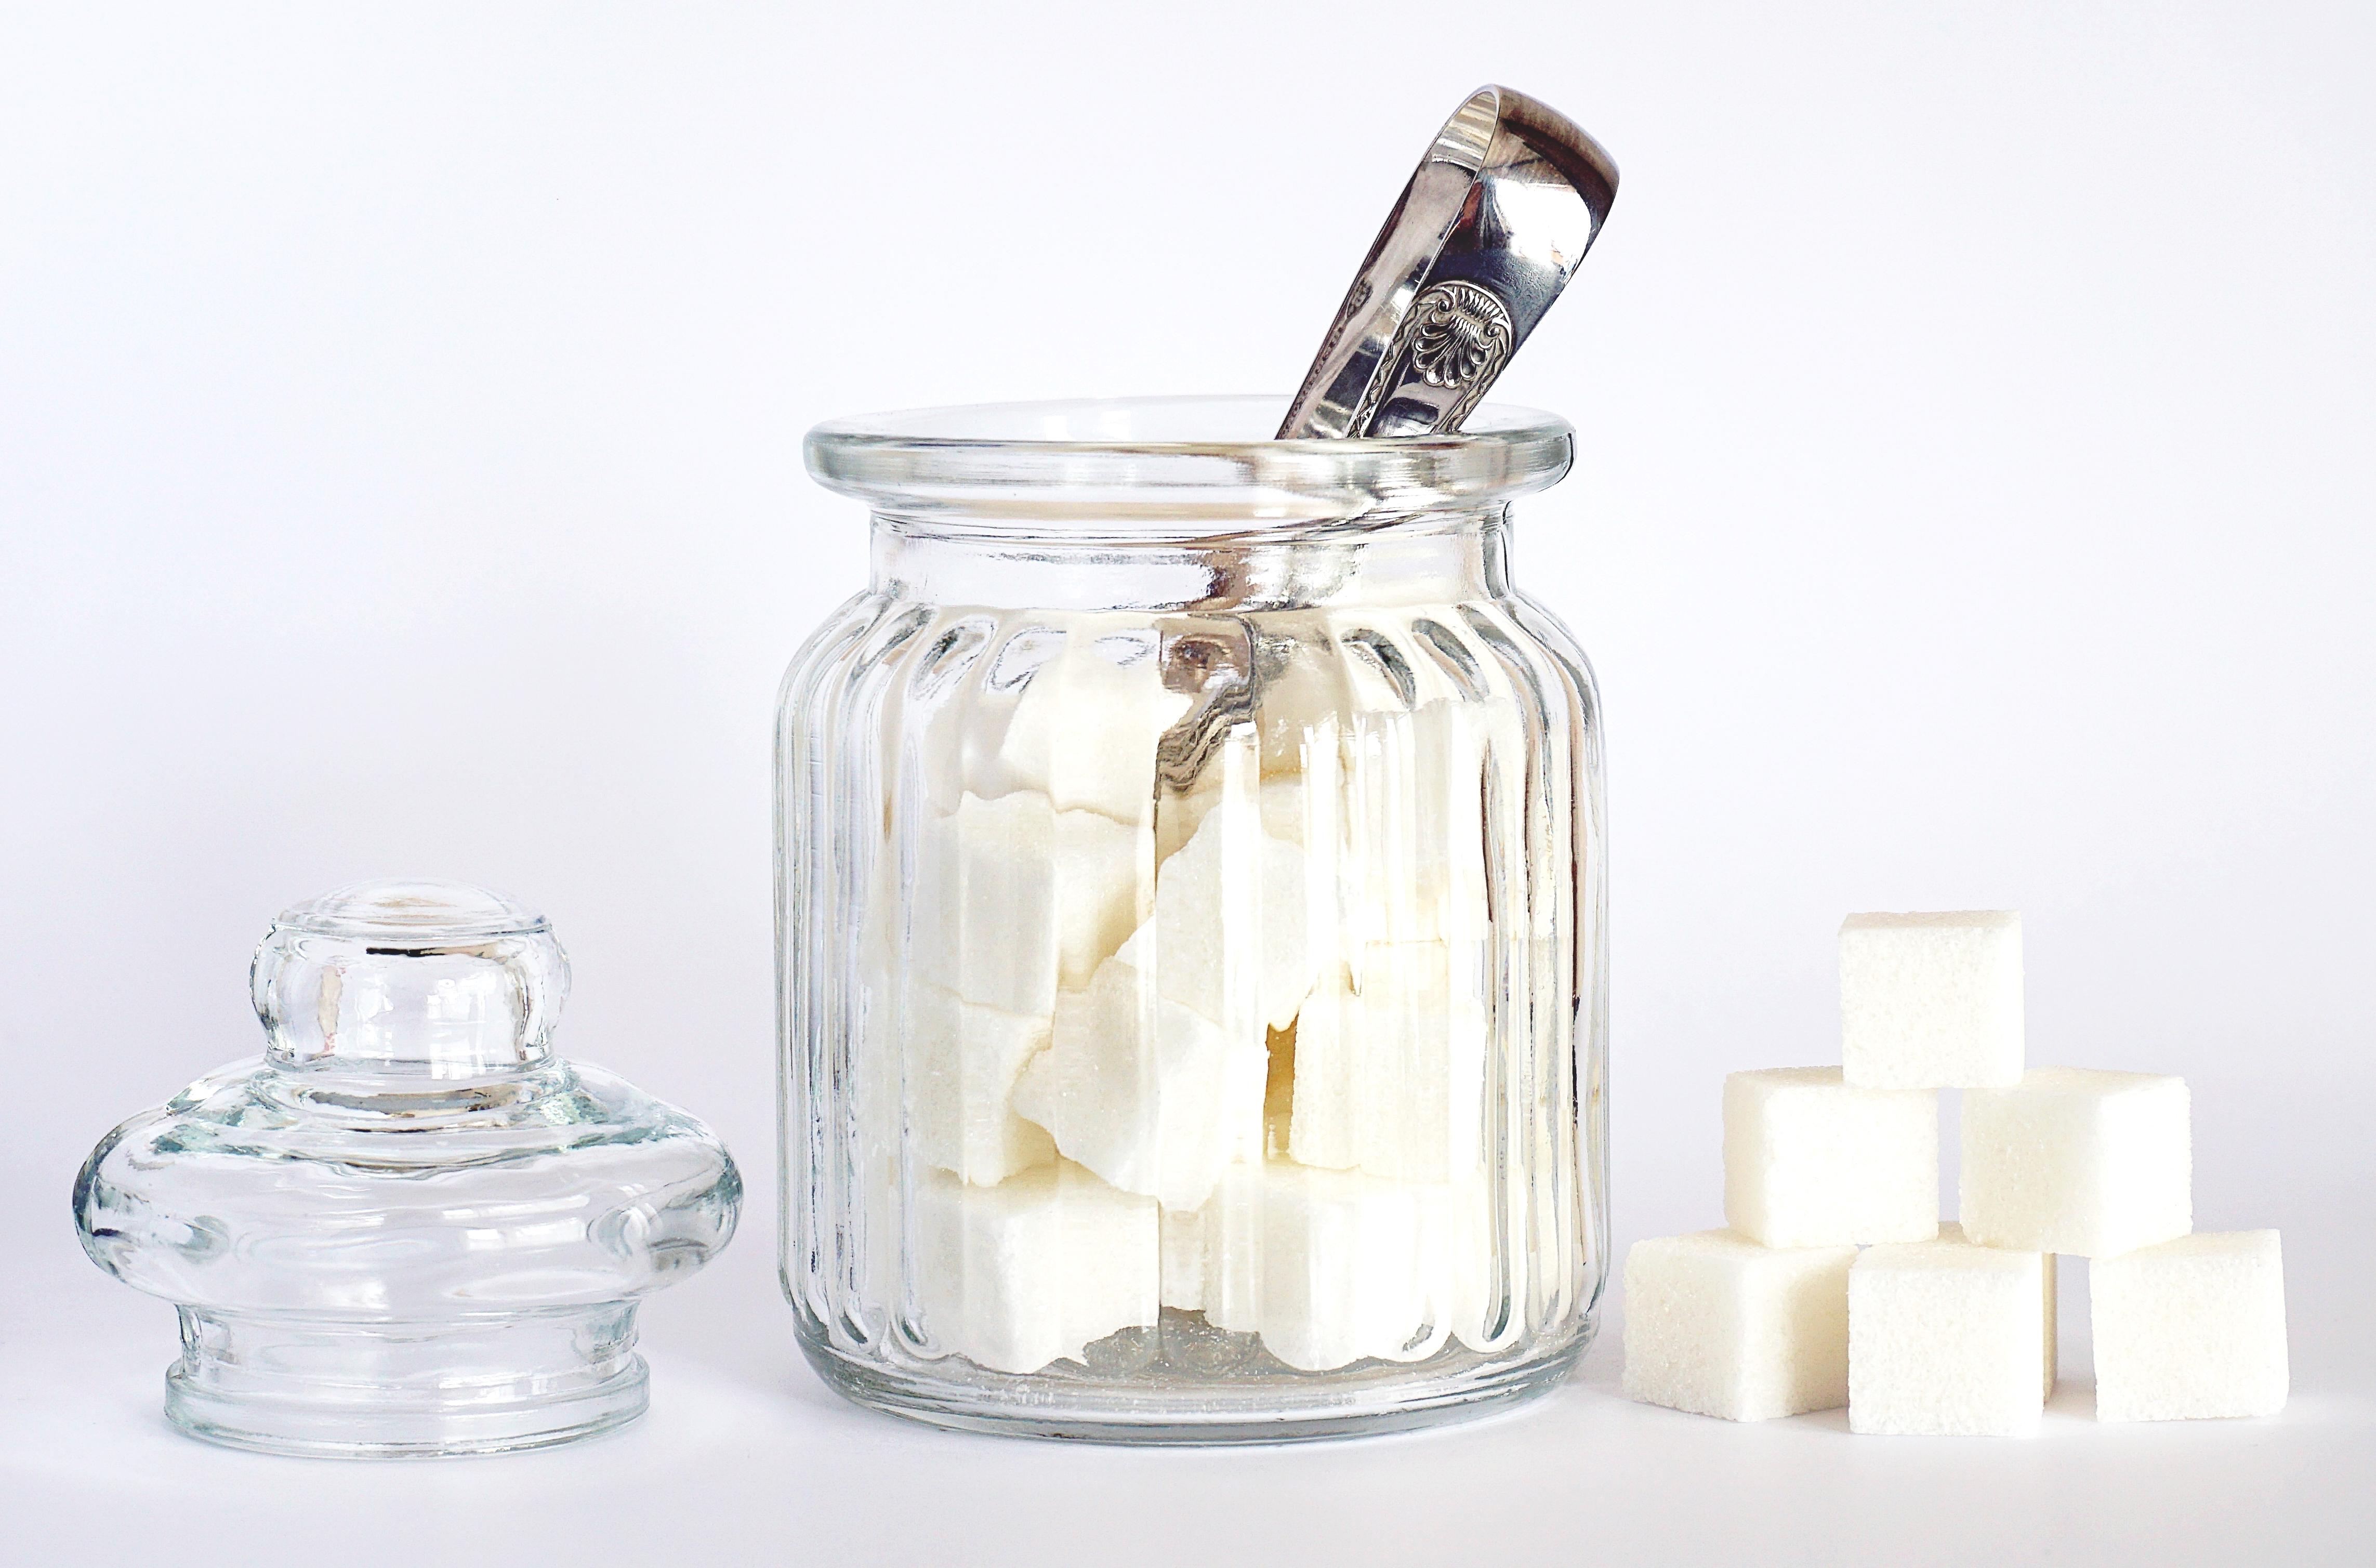 Close-Up Photo of Sugar Cubes in Glass Jar